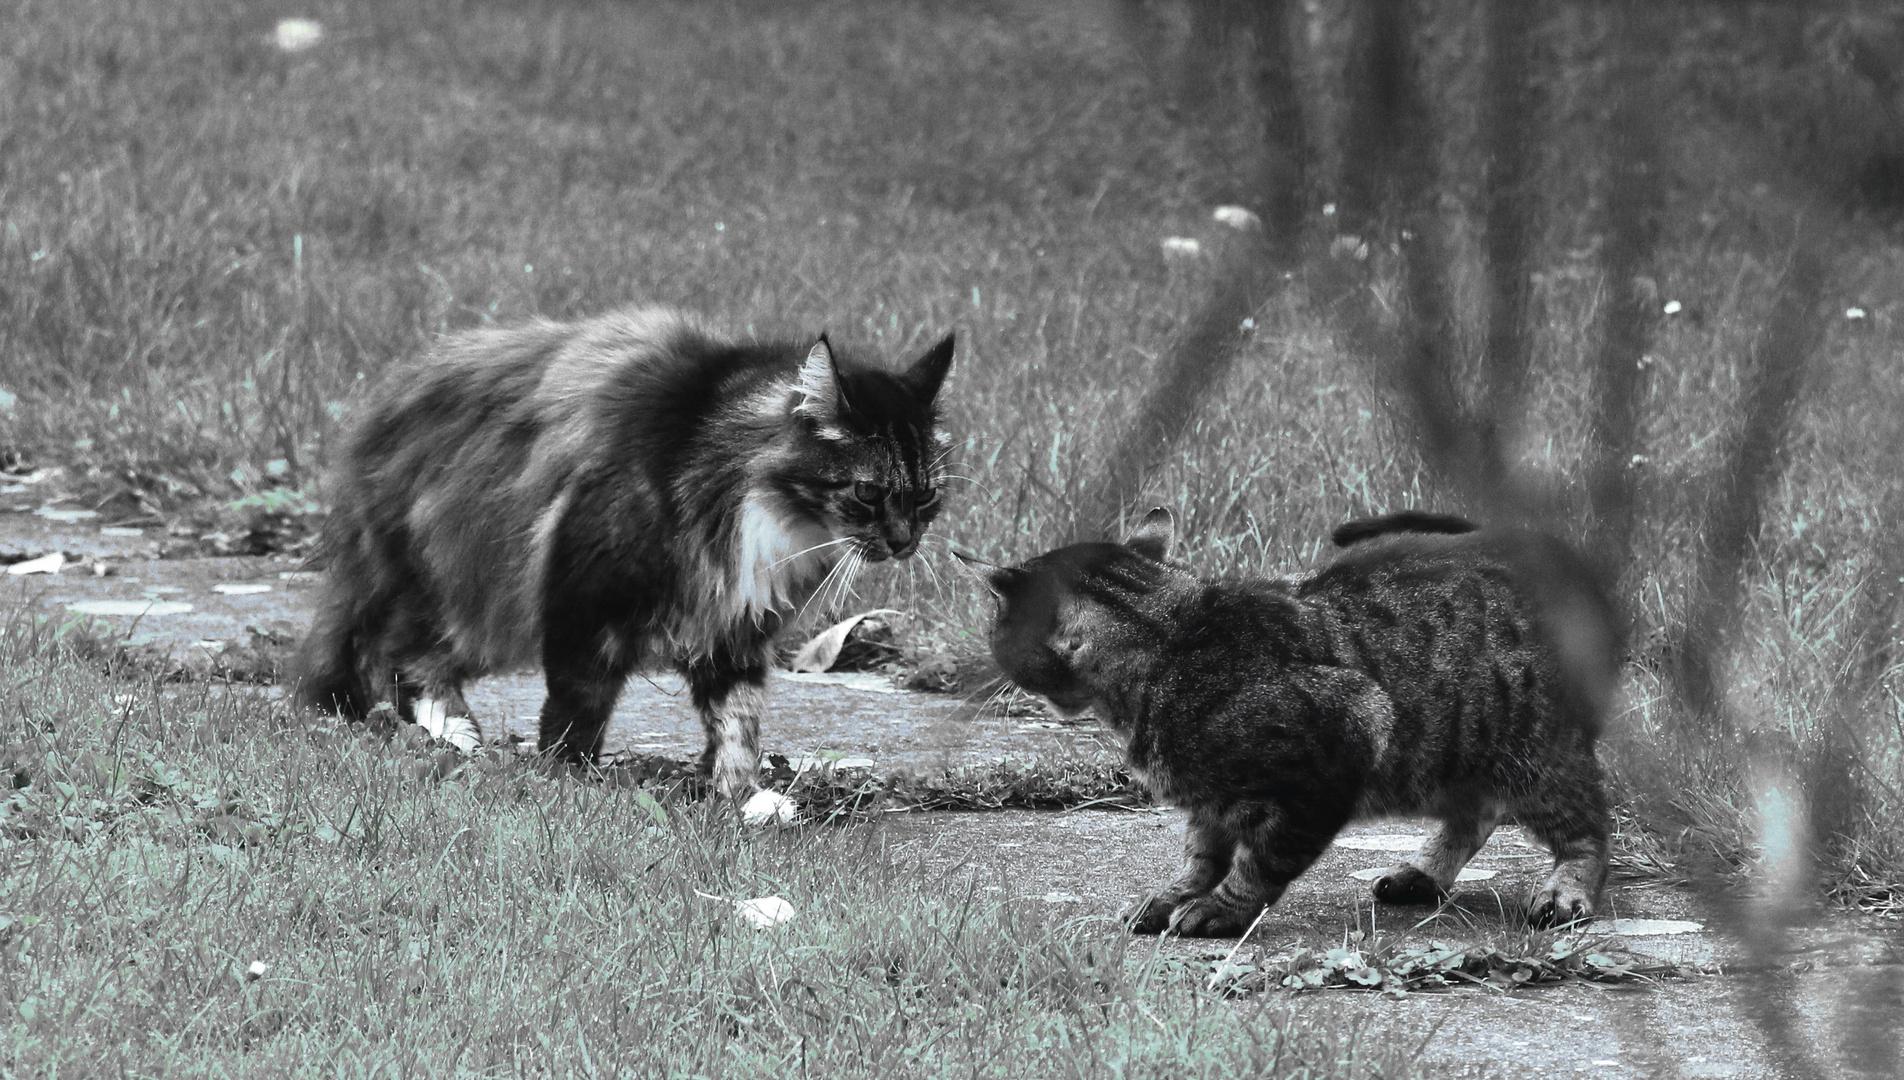 Mephisto vs. Woopie